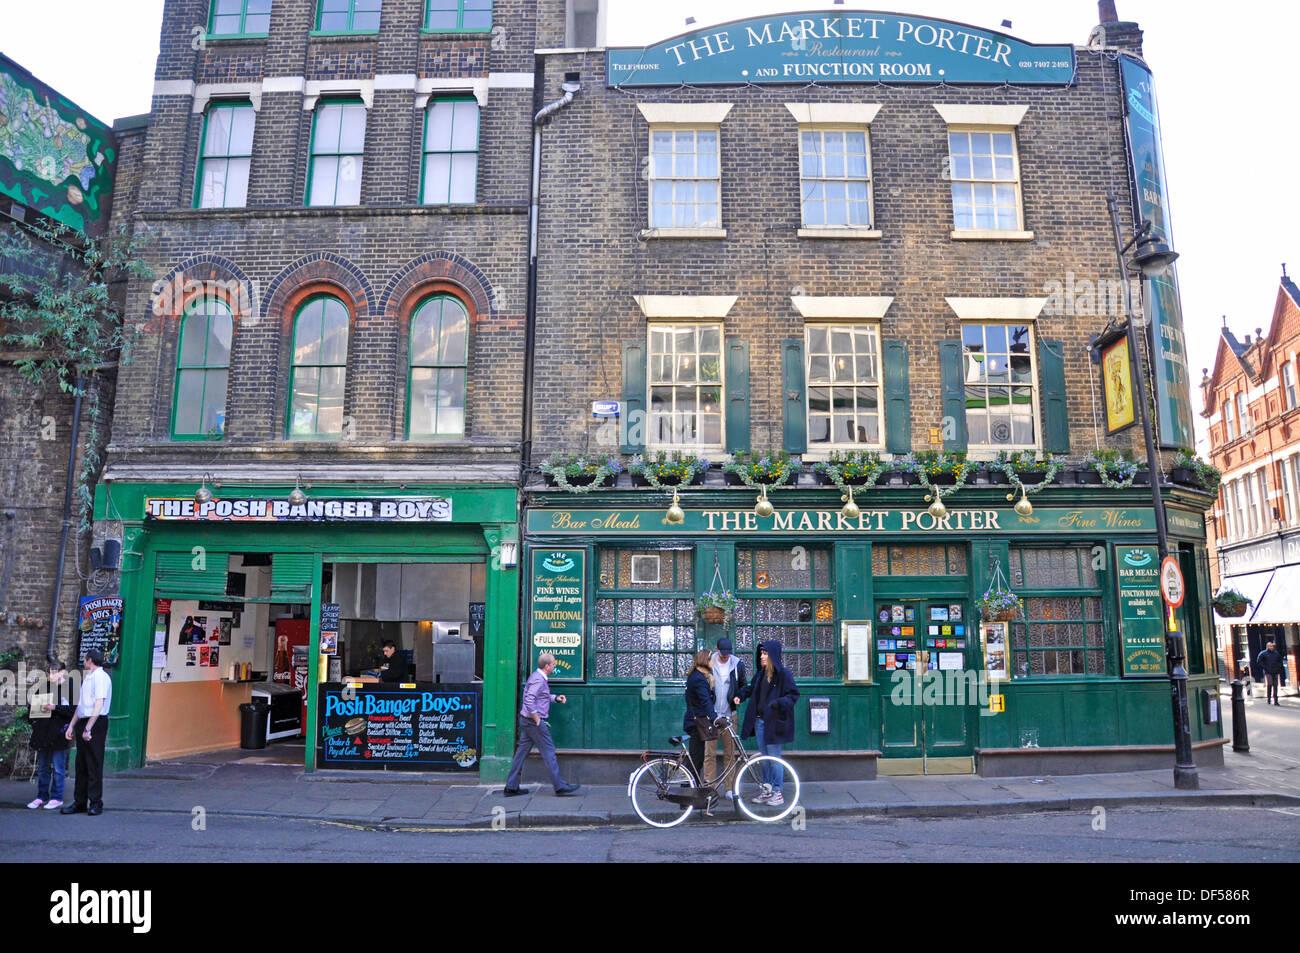 The Posh Banger Boys cafe and The Market Porter pub, directly opposite Borough Market (London's renowned food market). England, UK - Stock Image